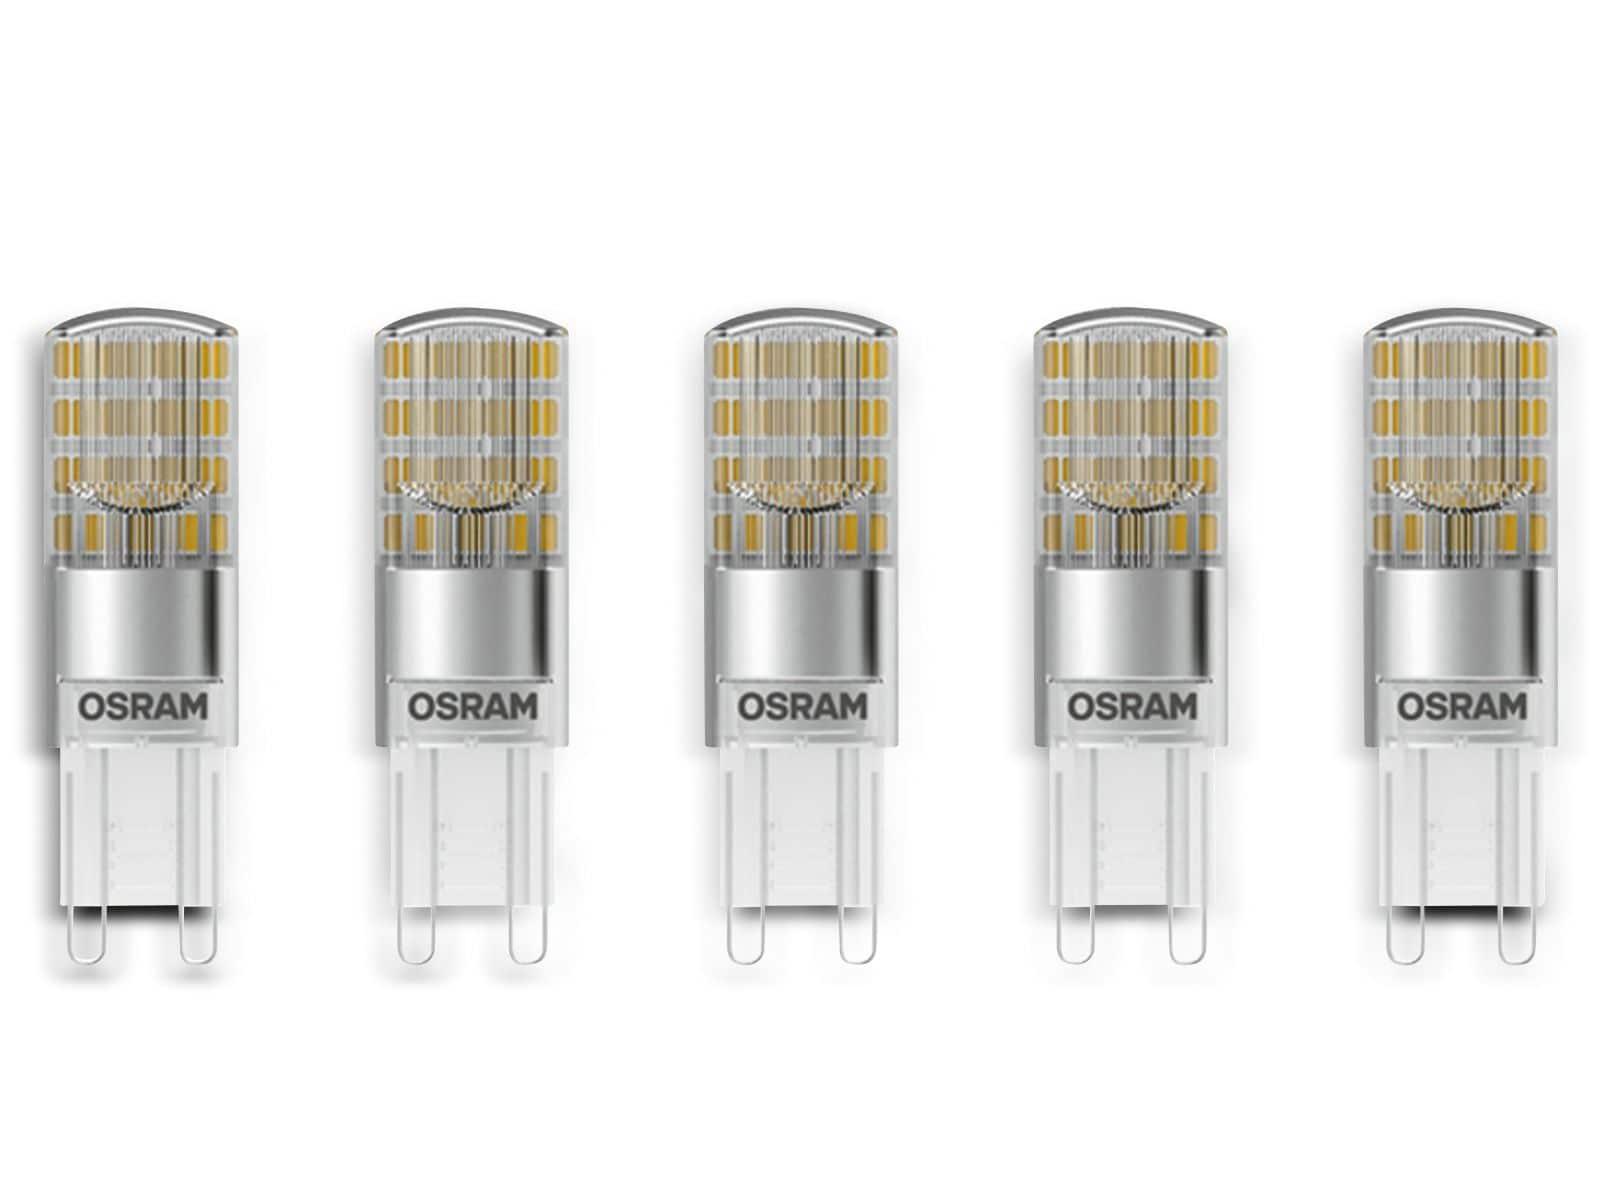 Led lampe osram star g9 eek: a 2 6 w 320 lm 2700 k 5 stück